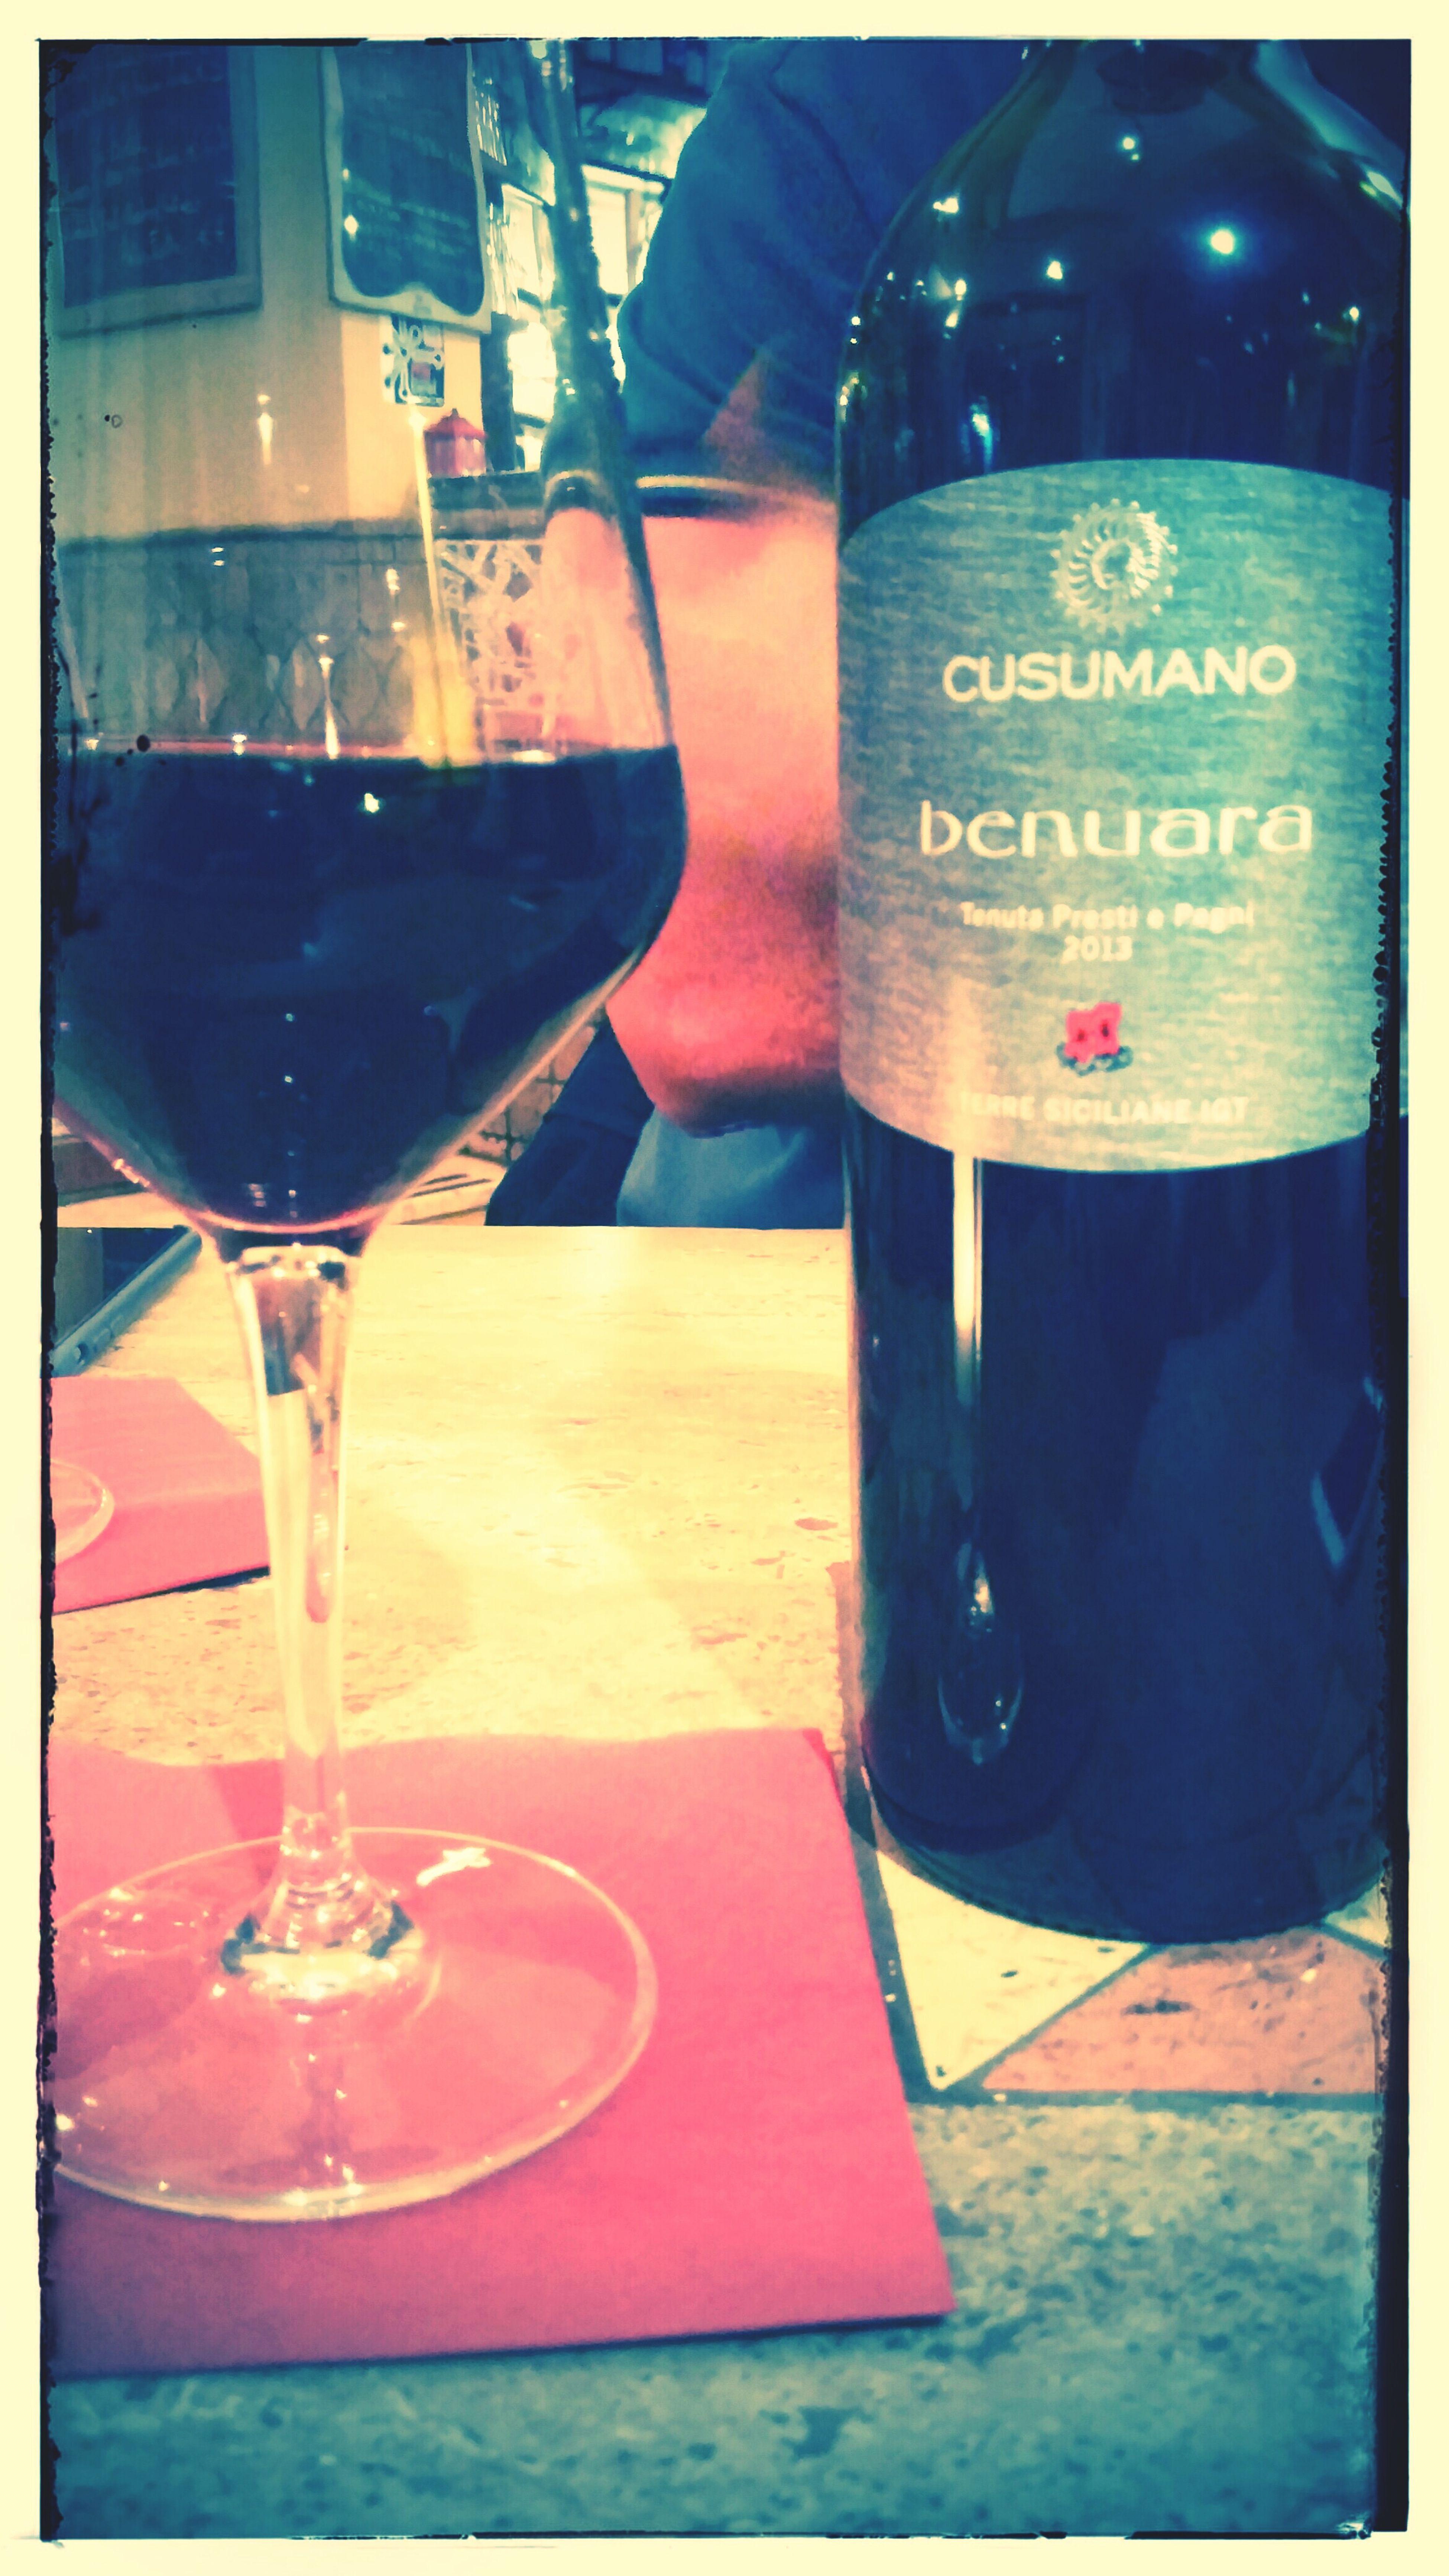 Red Wine Wine Tasting Relaxing Enjoying Life Lesbeauxjourssontlà Getting Inspired Masoeurmeconnaitsibien LaClasseAmericaine Lifeistooshorttodrinkcheapwine Great Atmosphere